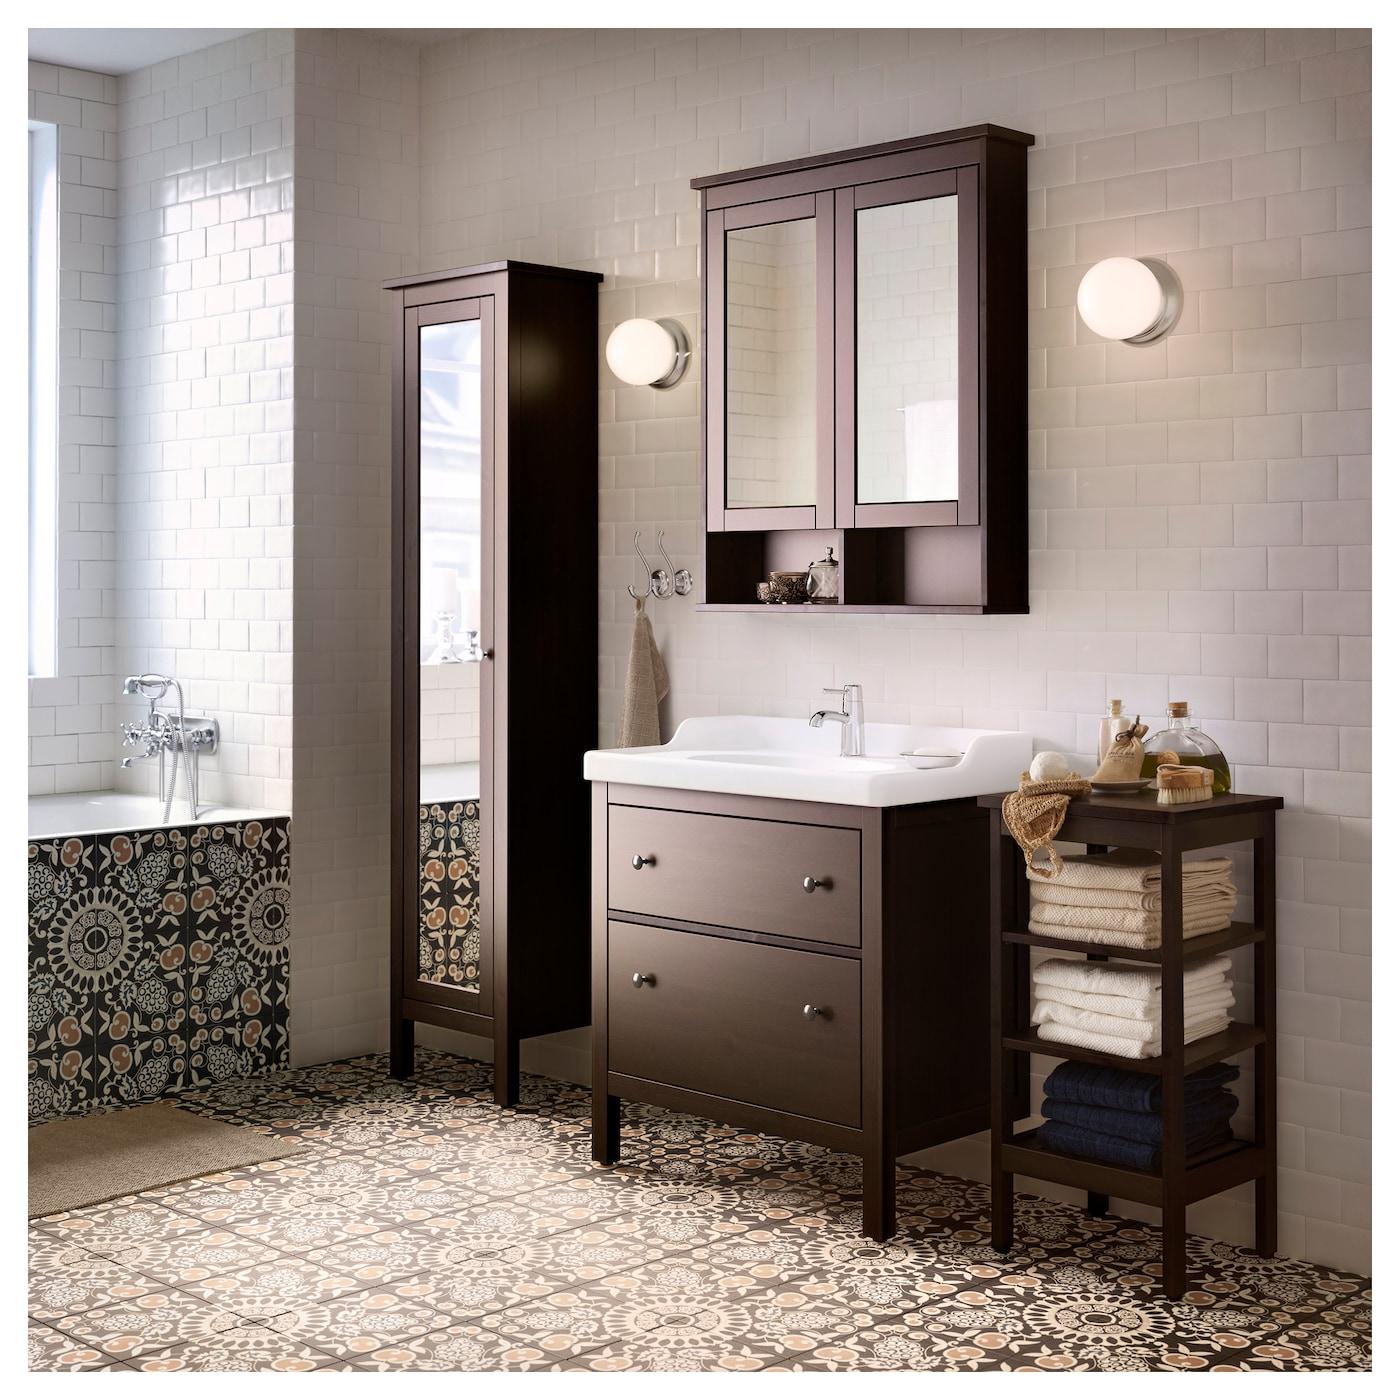 Hemnes RÄttviken Sink Cabinet With 2 Drawers Black Brown Stained Runskär Faucet 32 1 4x19 1 4x35 Ikea